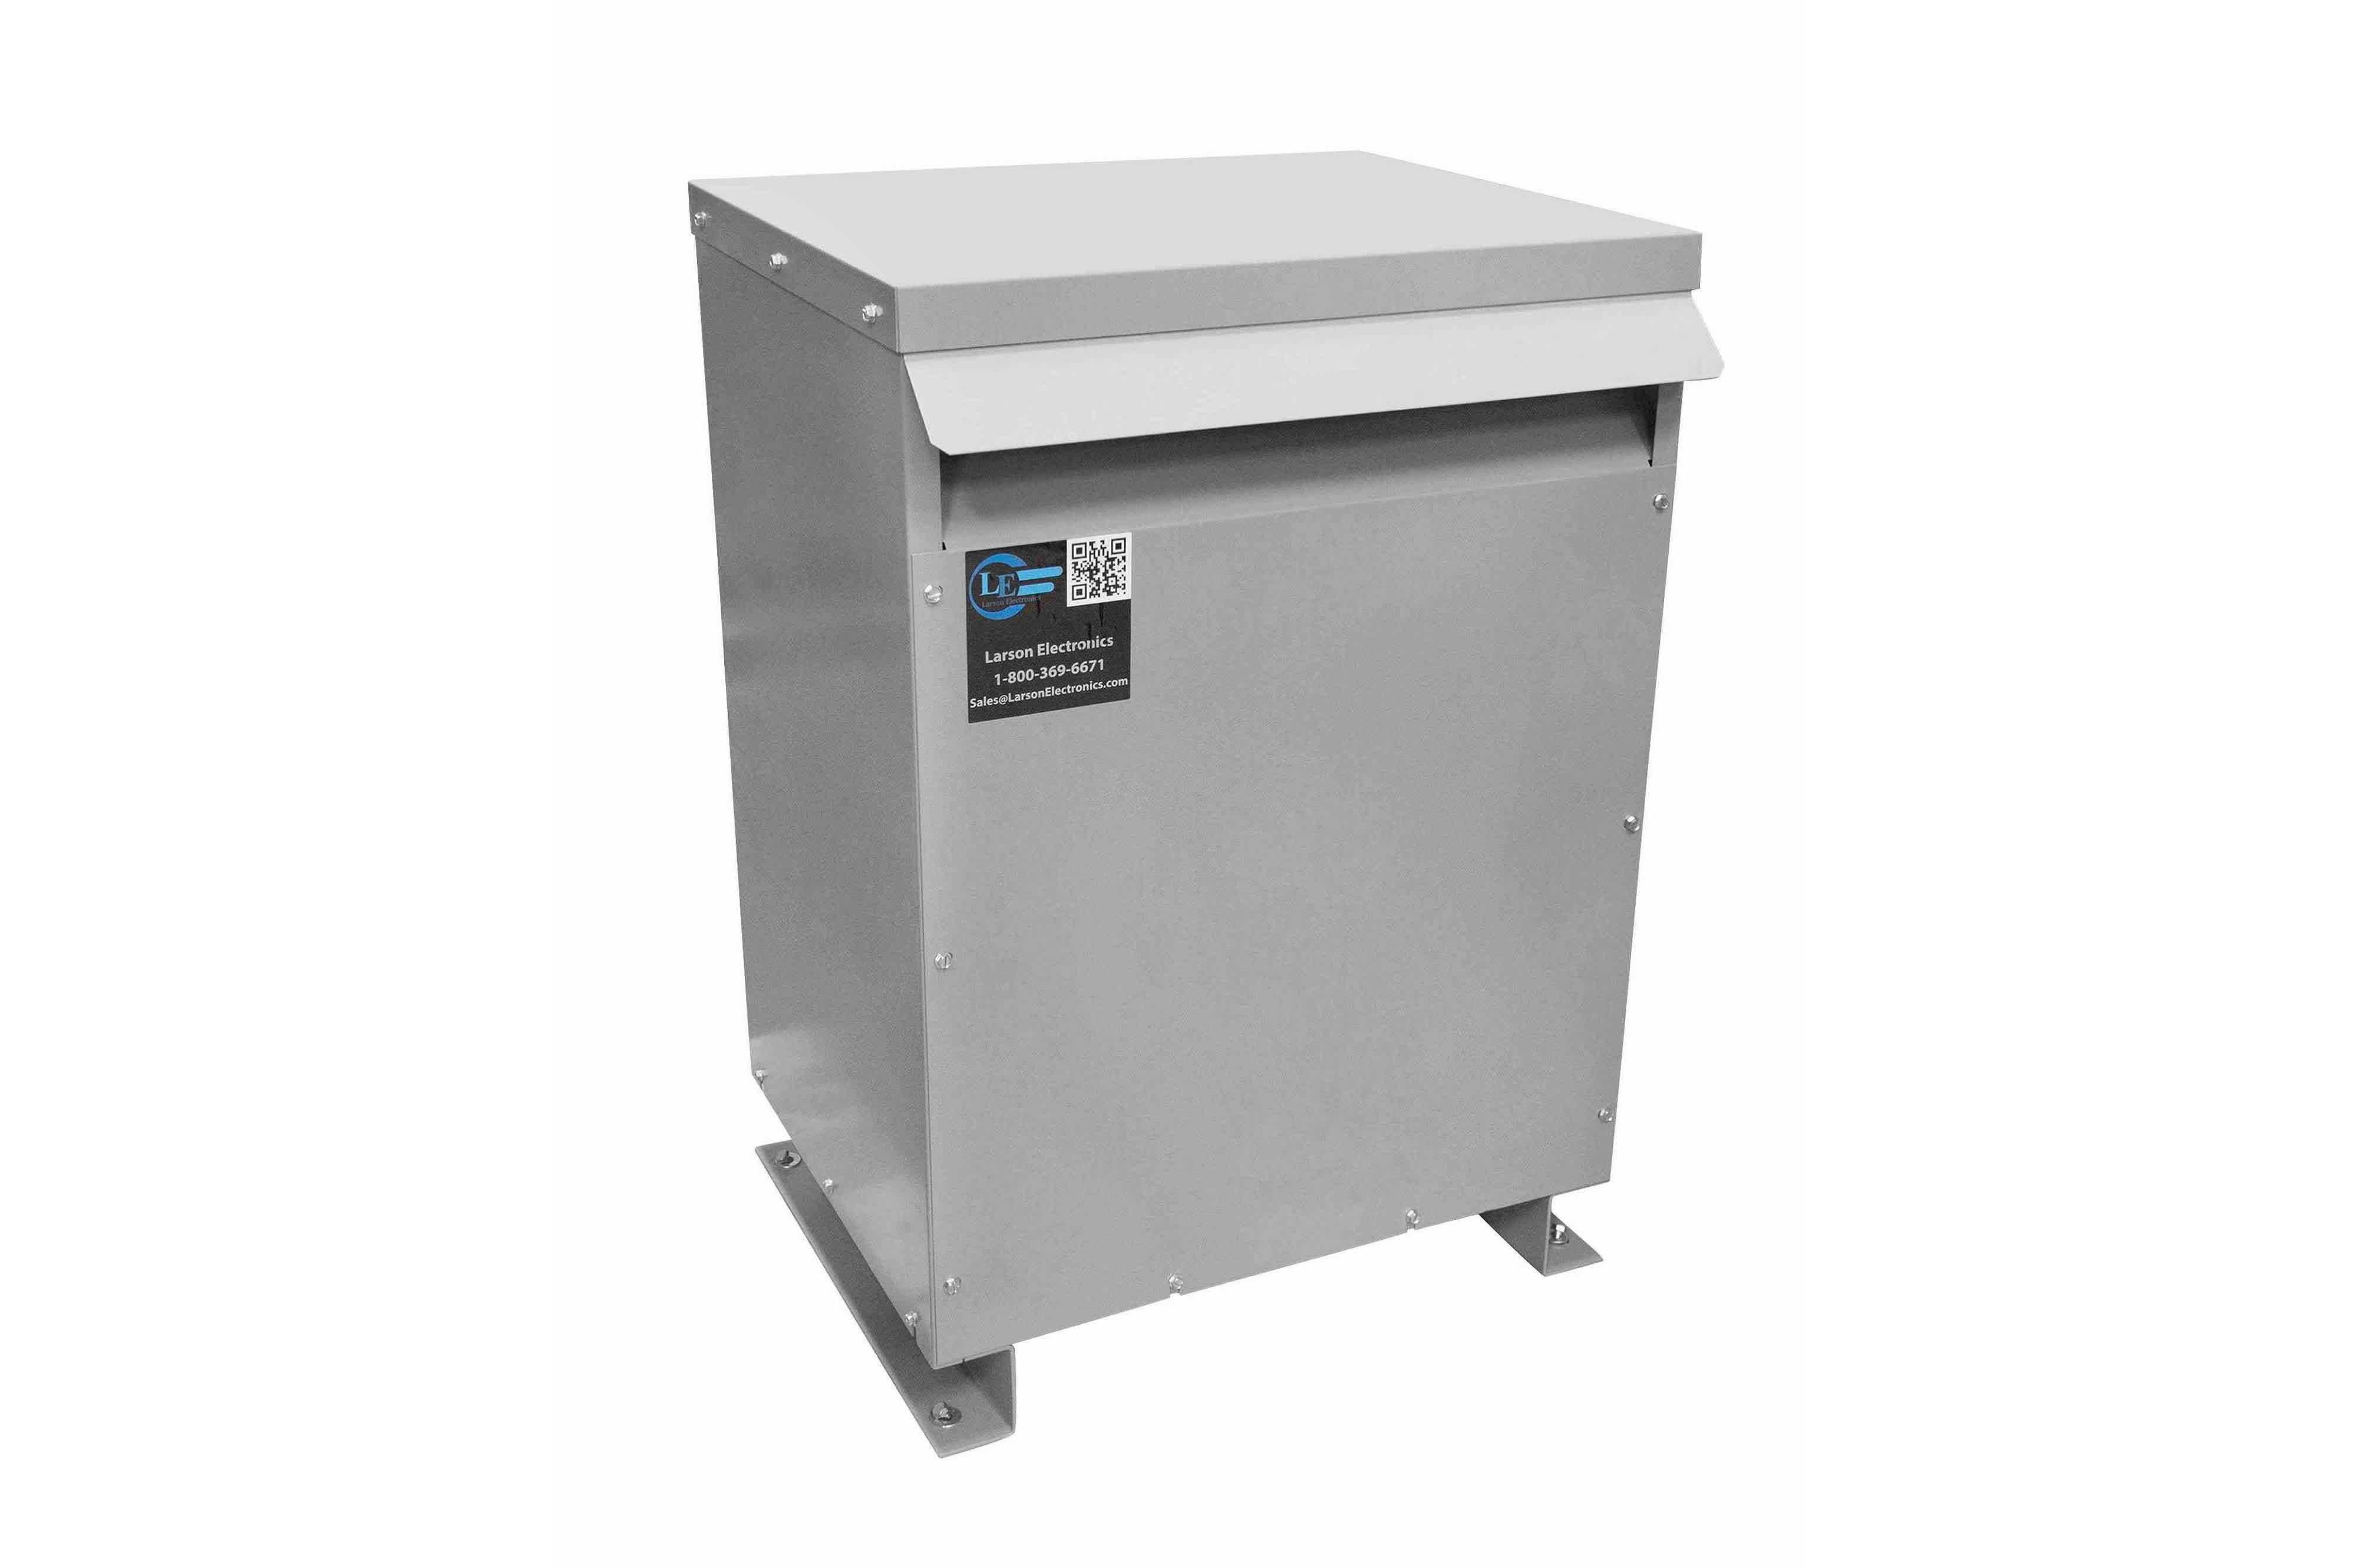 300 kVA 3PH DOE Transformer, 480V Delta Primary, 480Y/277 Wye-N Secondary, N3R, Ventilated, 60 Hz